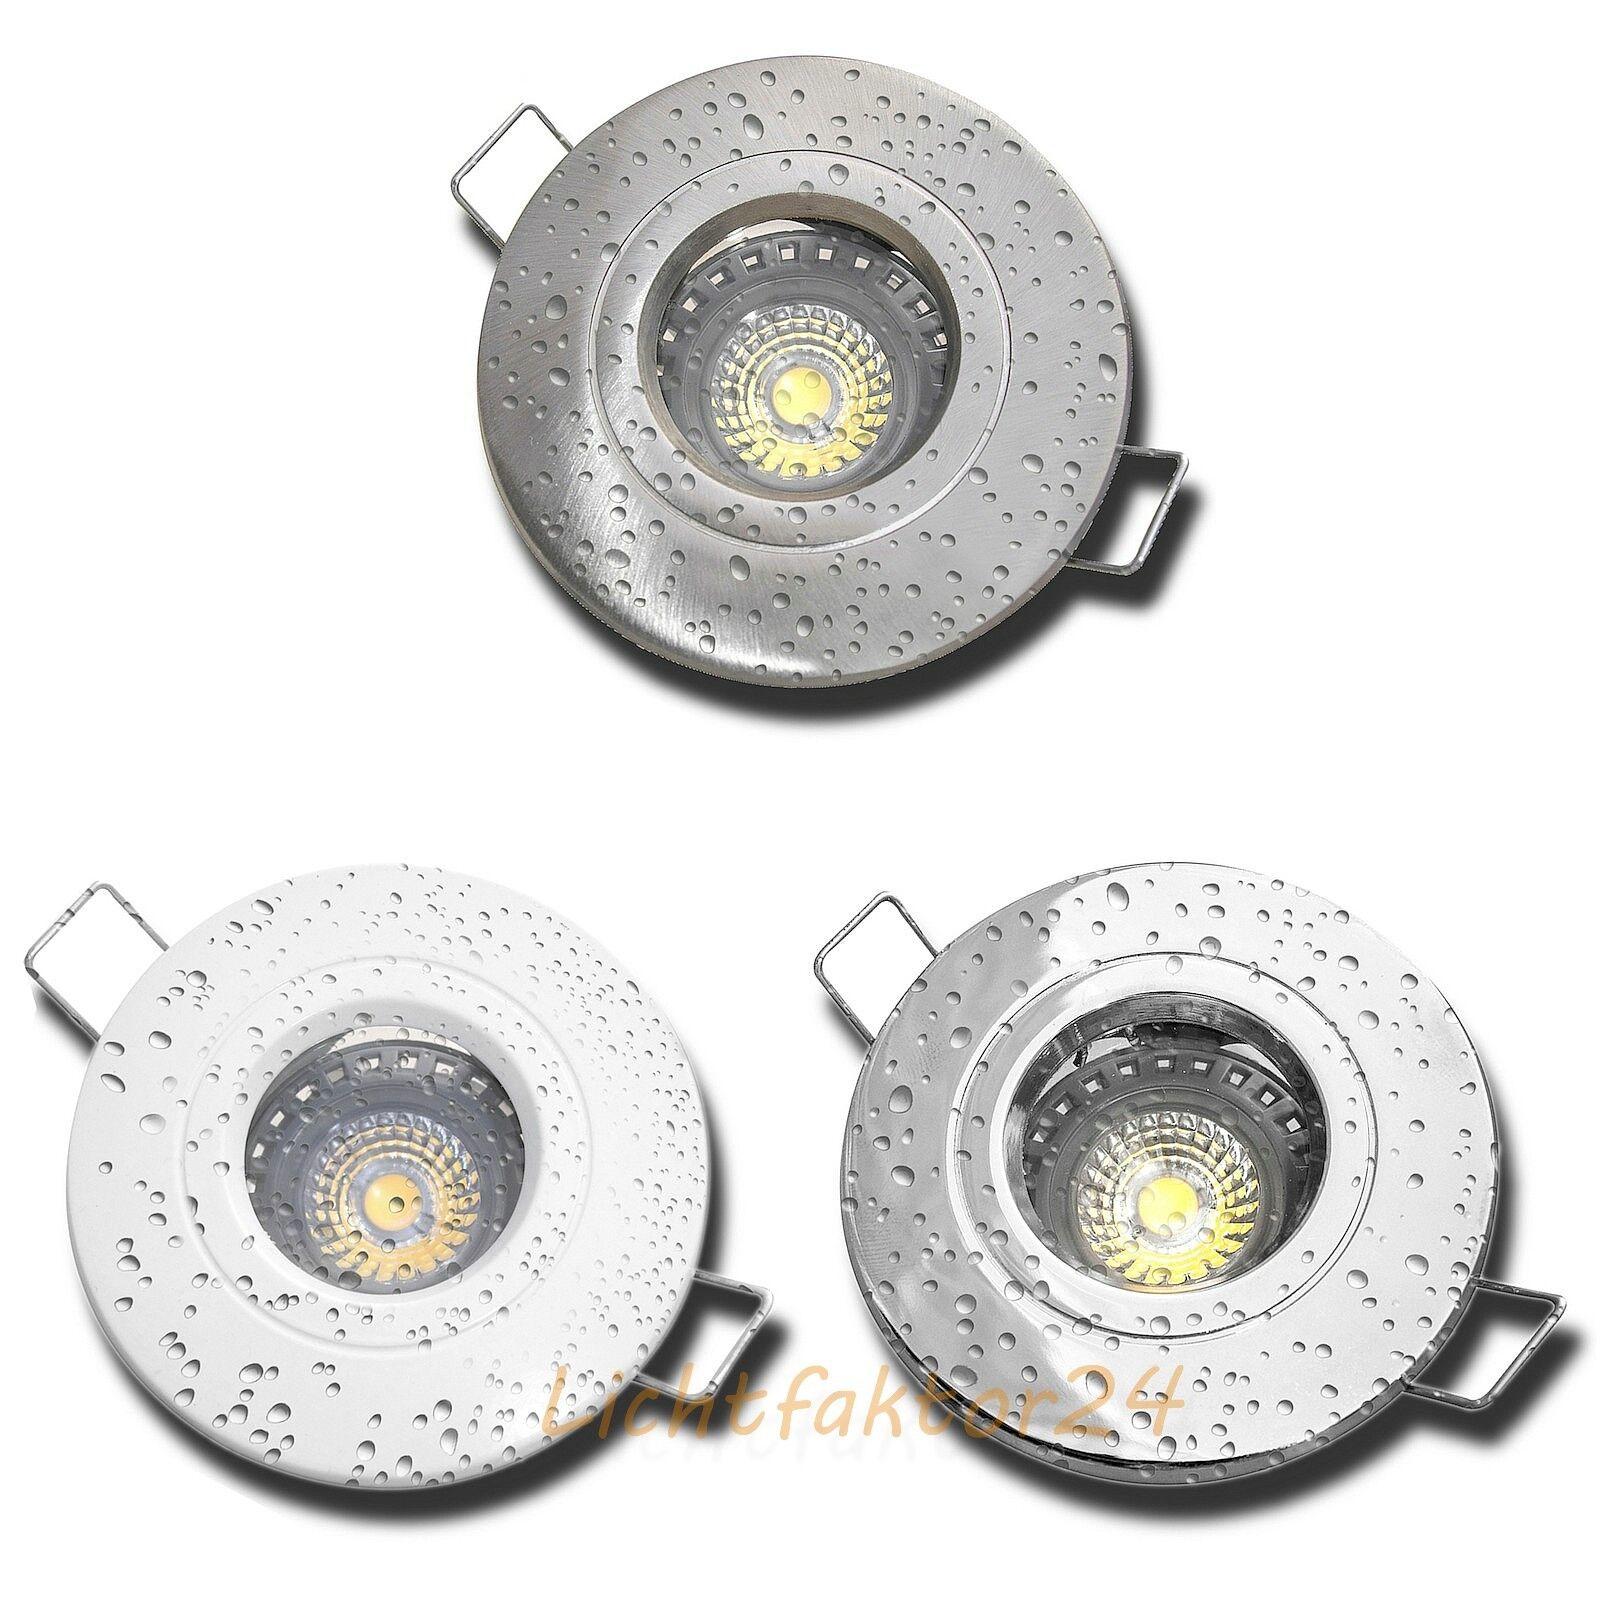 1-10er Set Bad Einbaustrahler Nautik44 230V IP44 5W LED Spots über Bad & Dusche